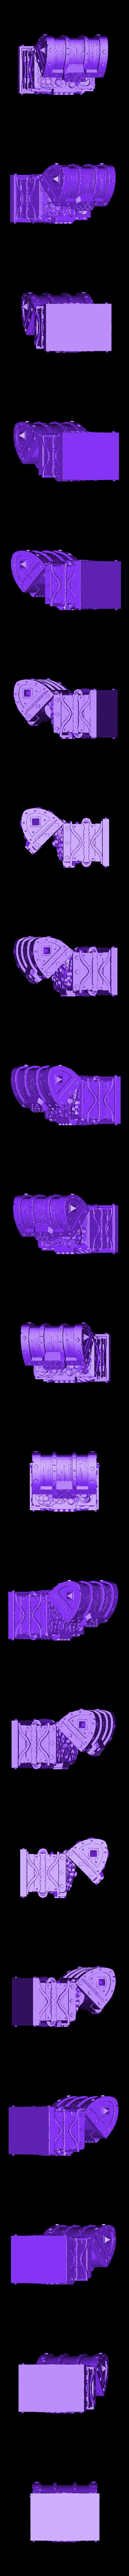 DRUID-OPENED.stl Download free STL file TREASURE CHEST OPENED • 3D printer model, PrintYourMonsters